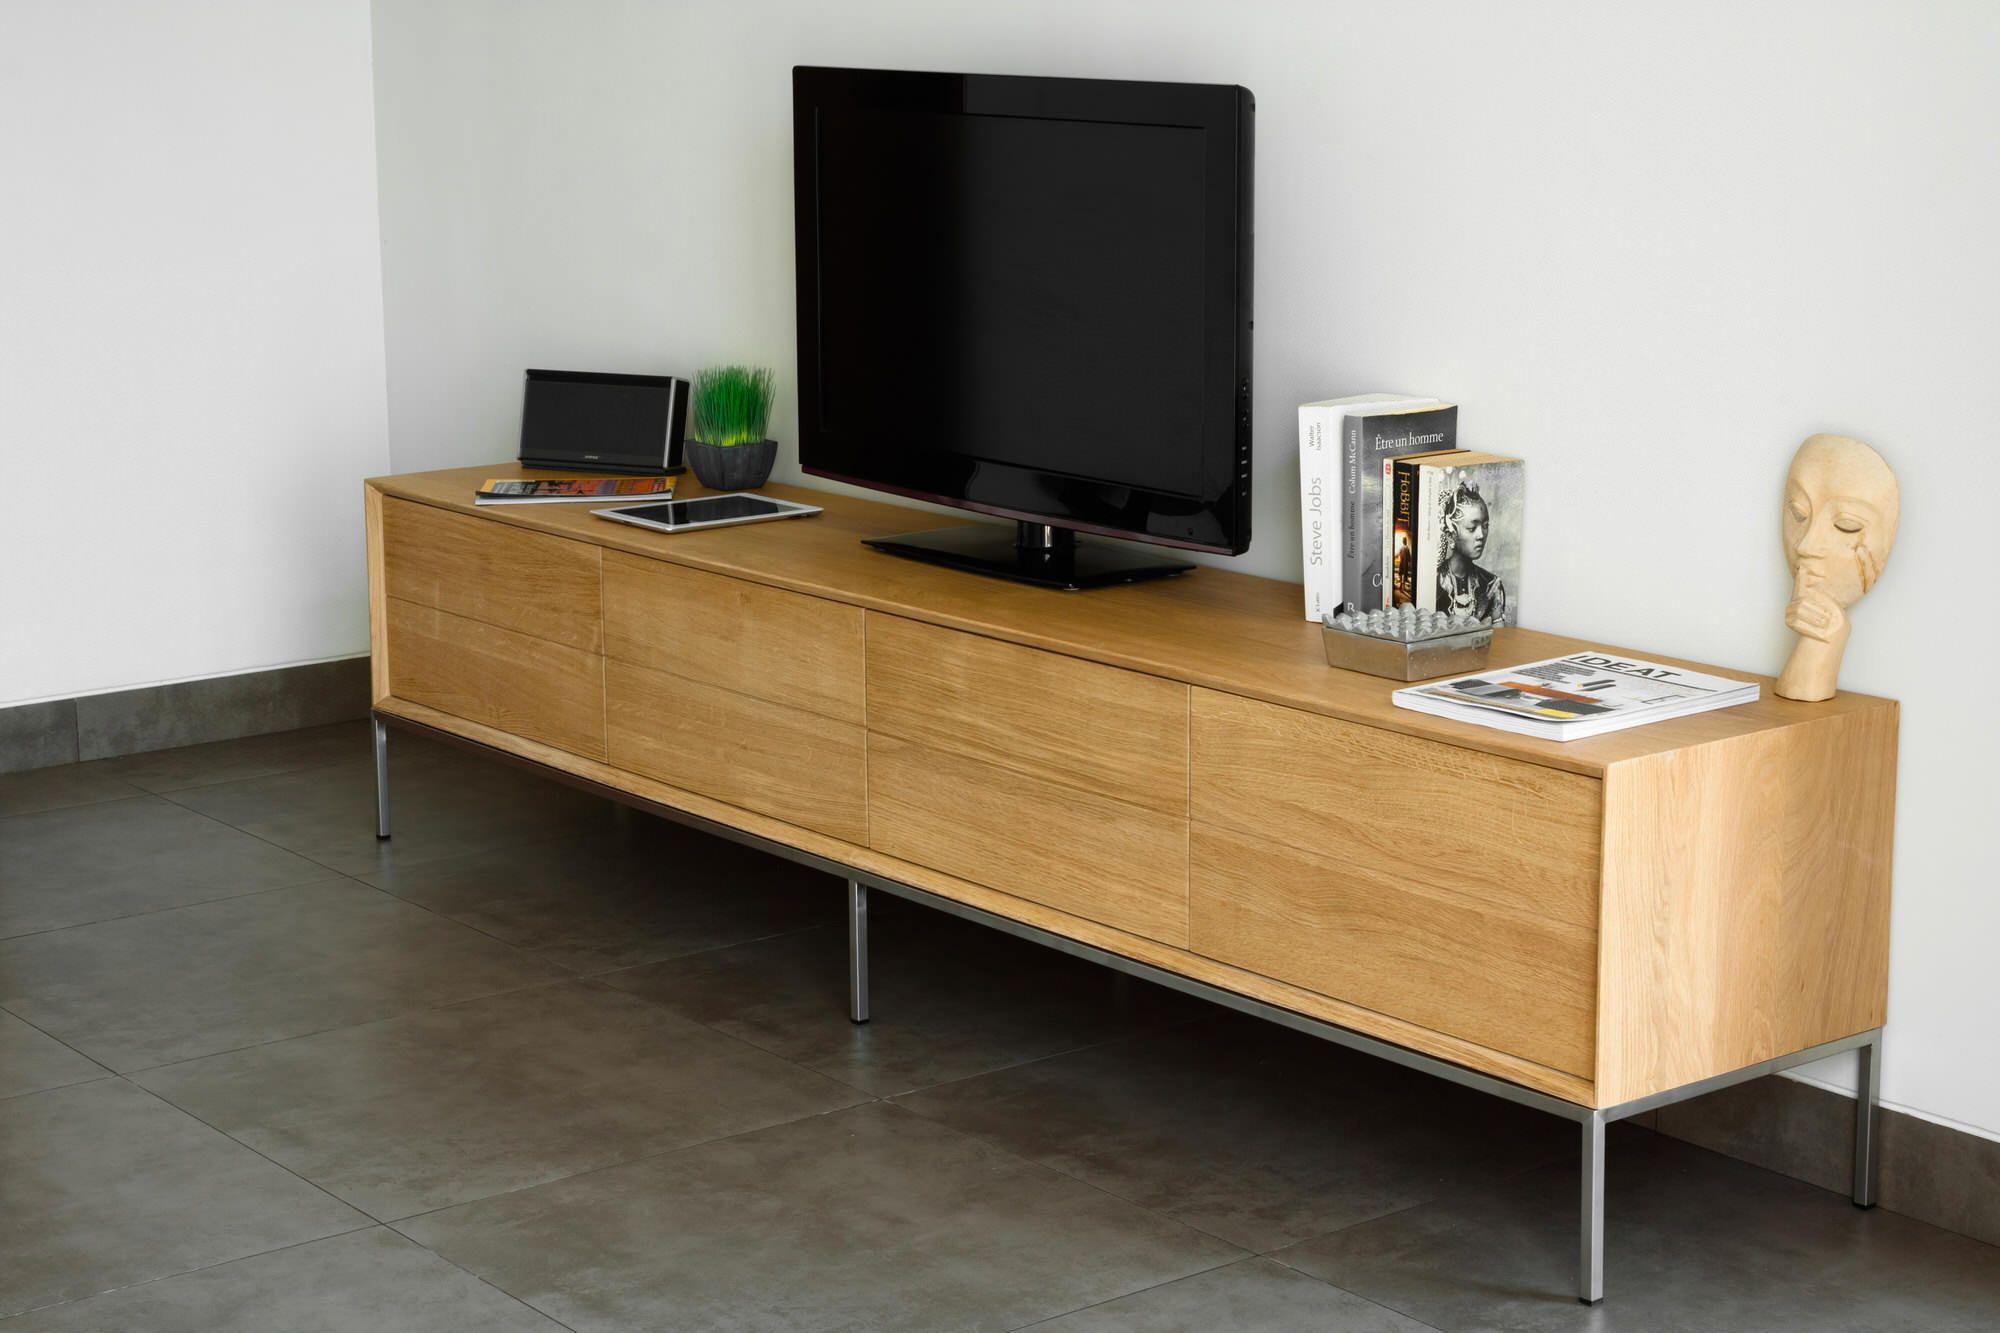 meuble tv cute kubico chene massif delorm bois clair